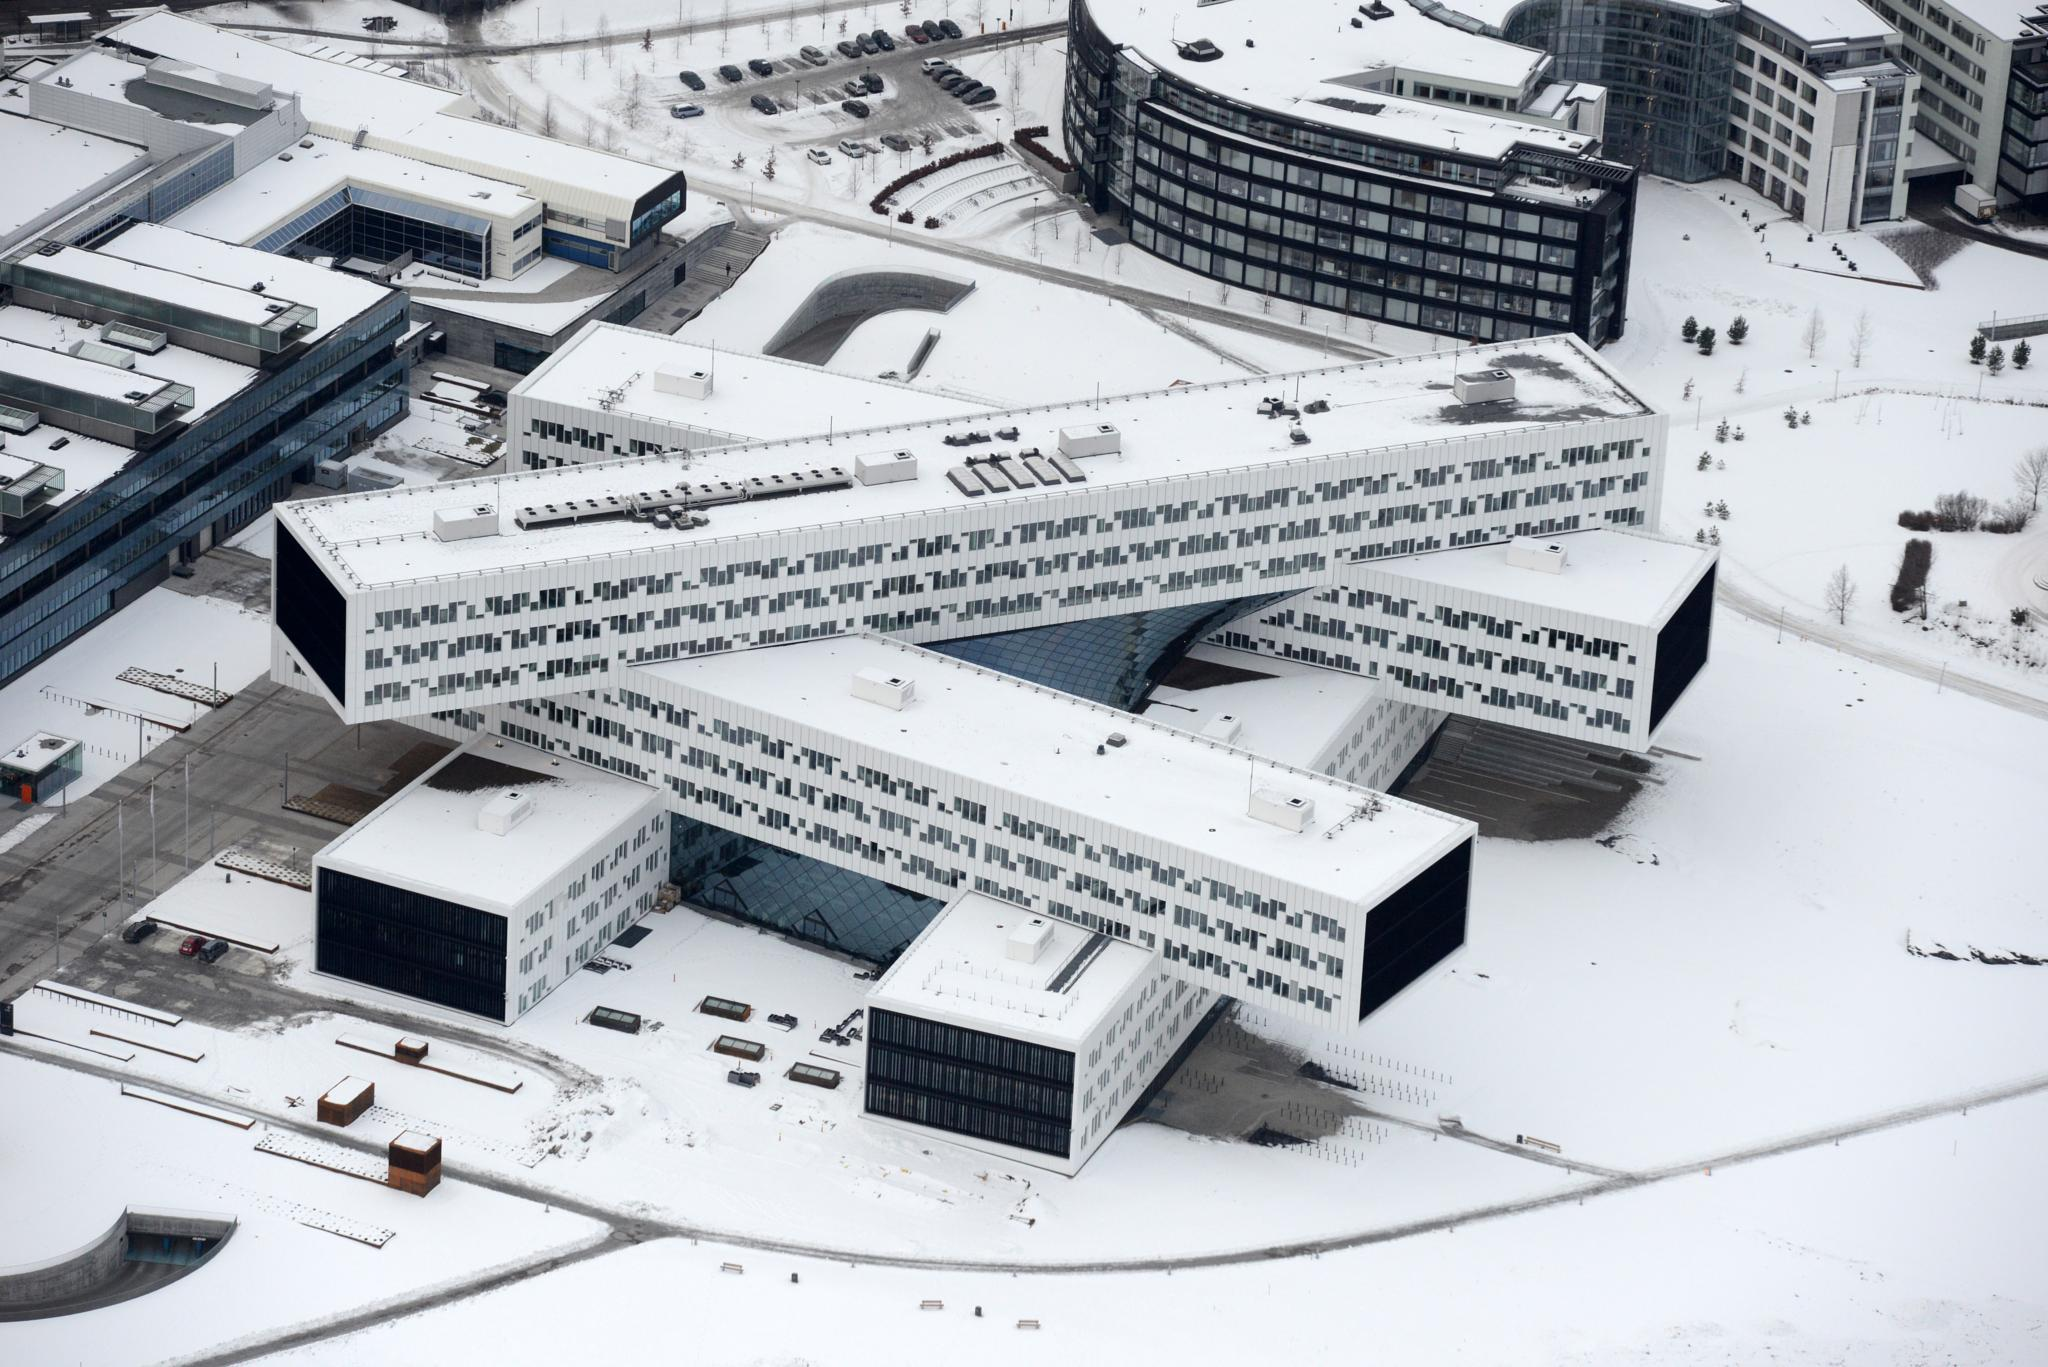 Statoil, Norway by Lasse Tur